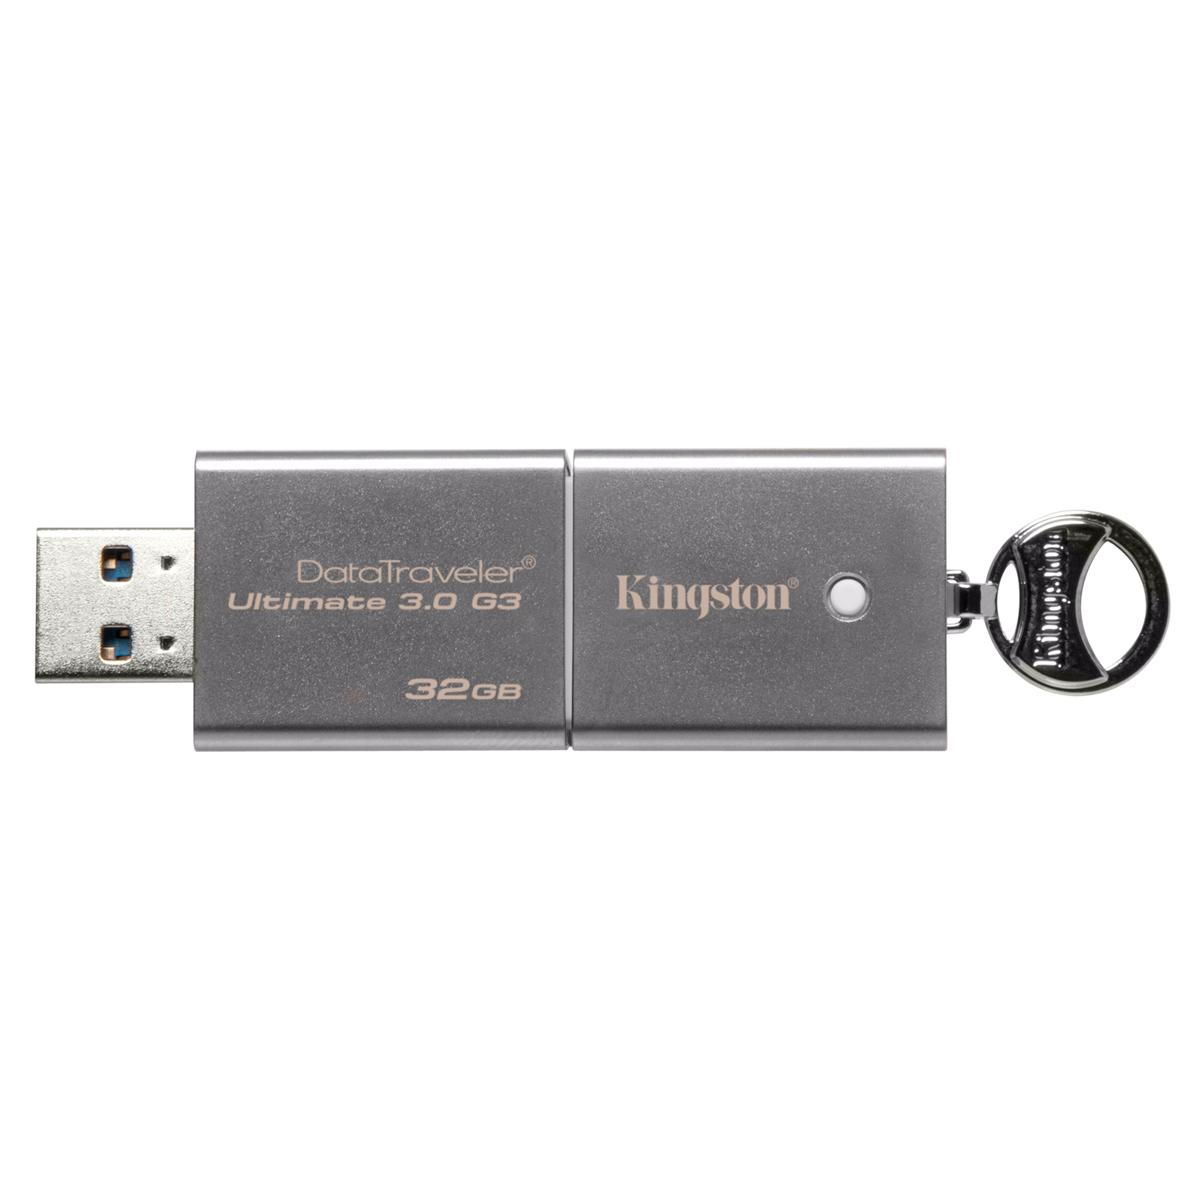 Clé USB Kingston DataTraveler Ultimate G3 32 Go Clé USB 3.0 32 Go (garantie constructeur 5 ans)